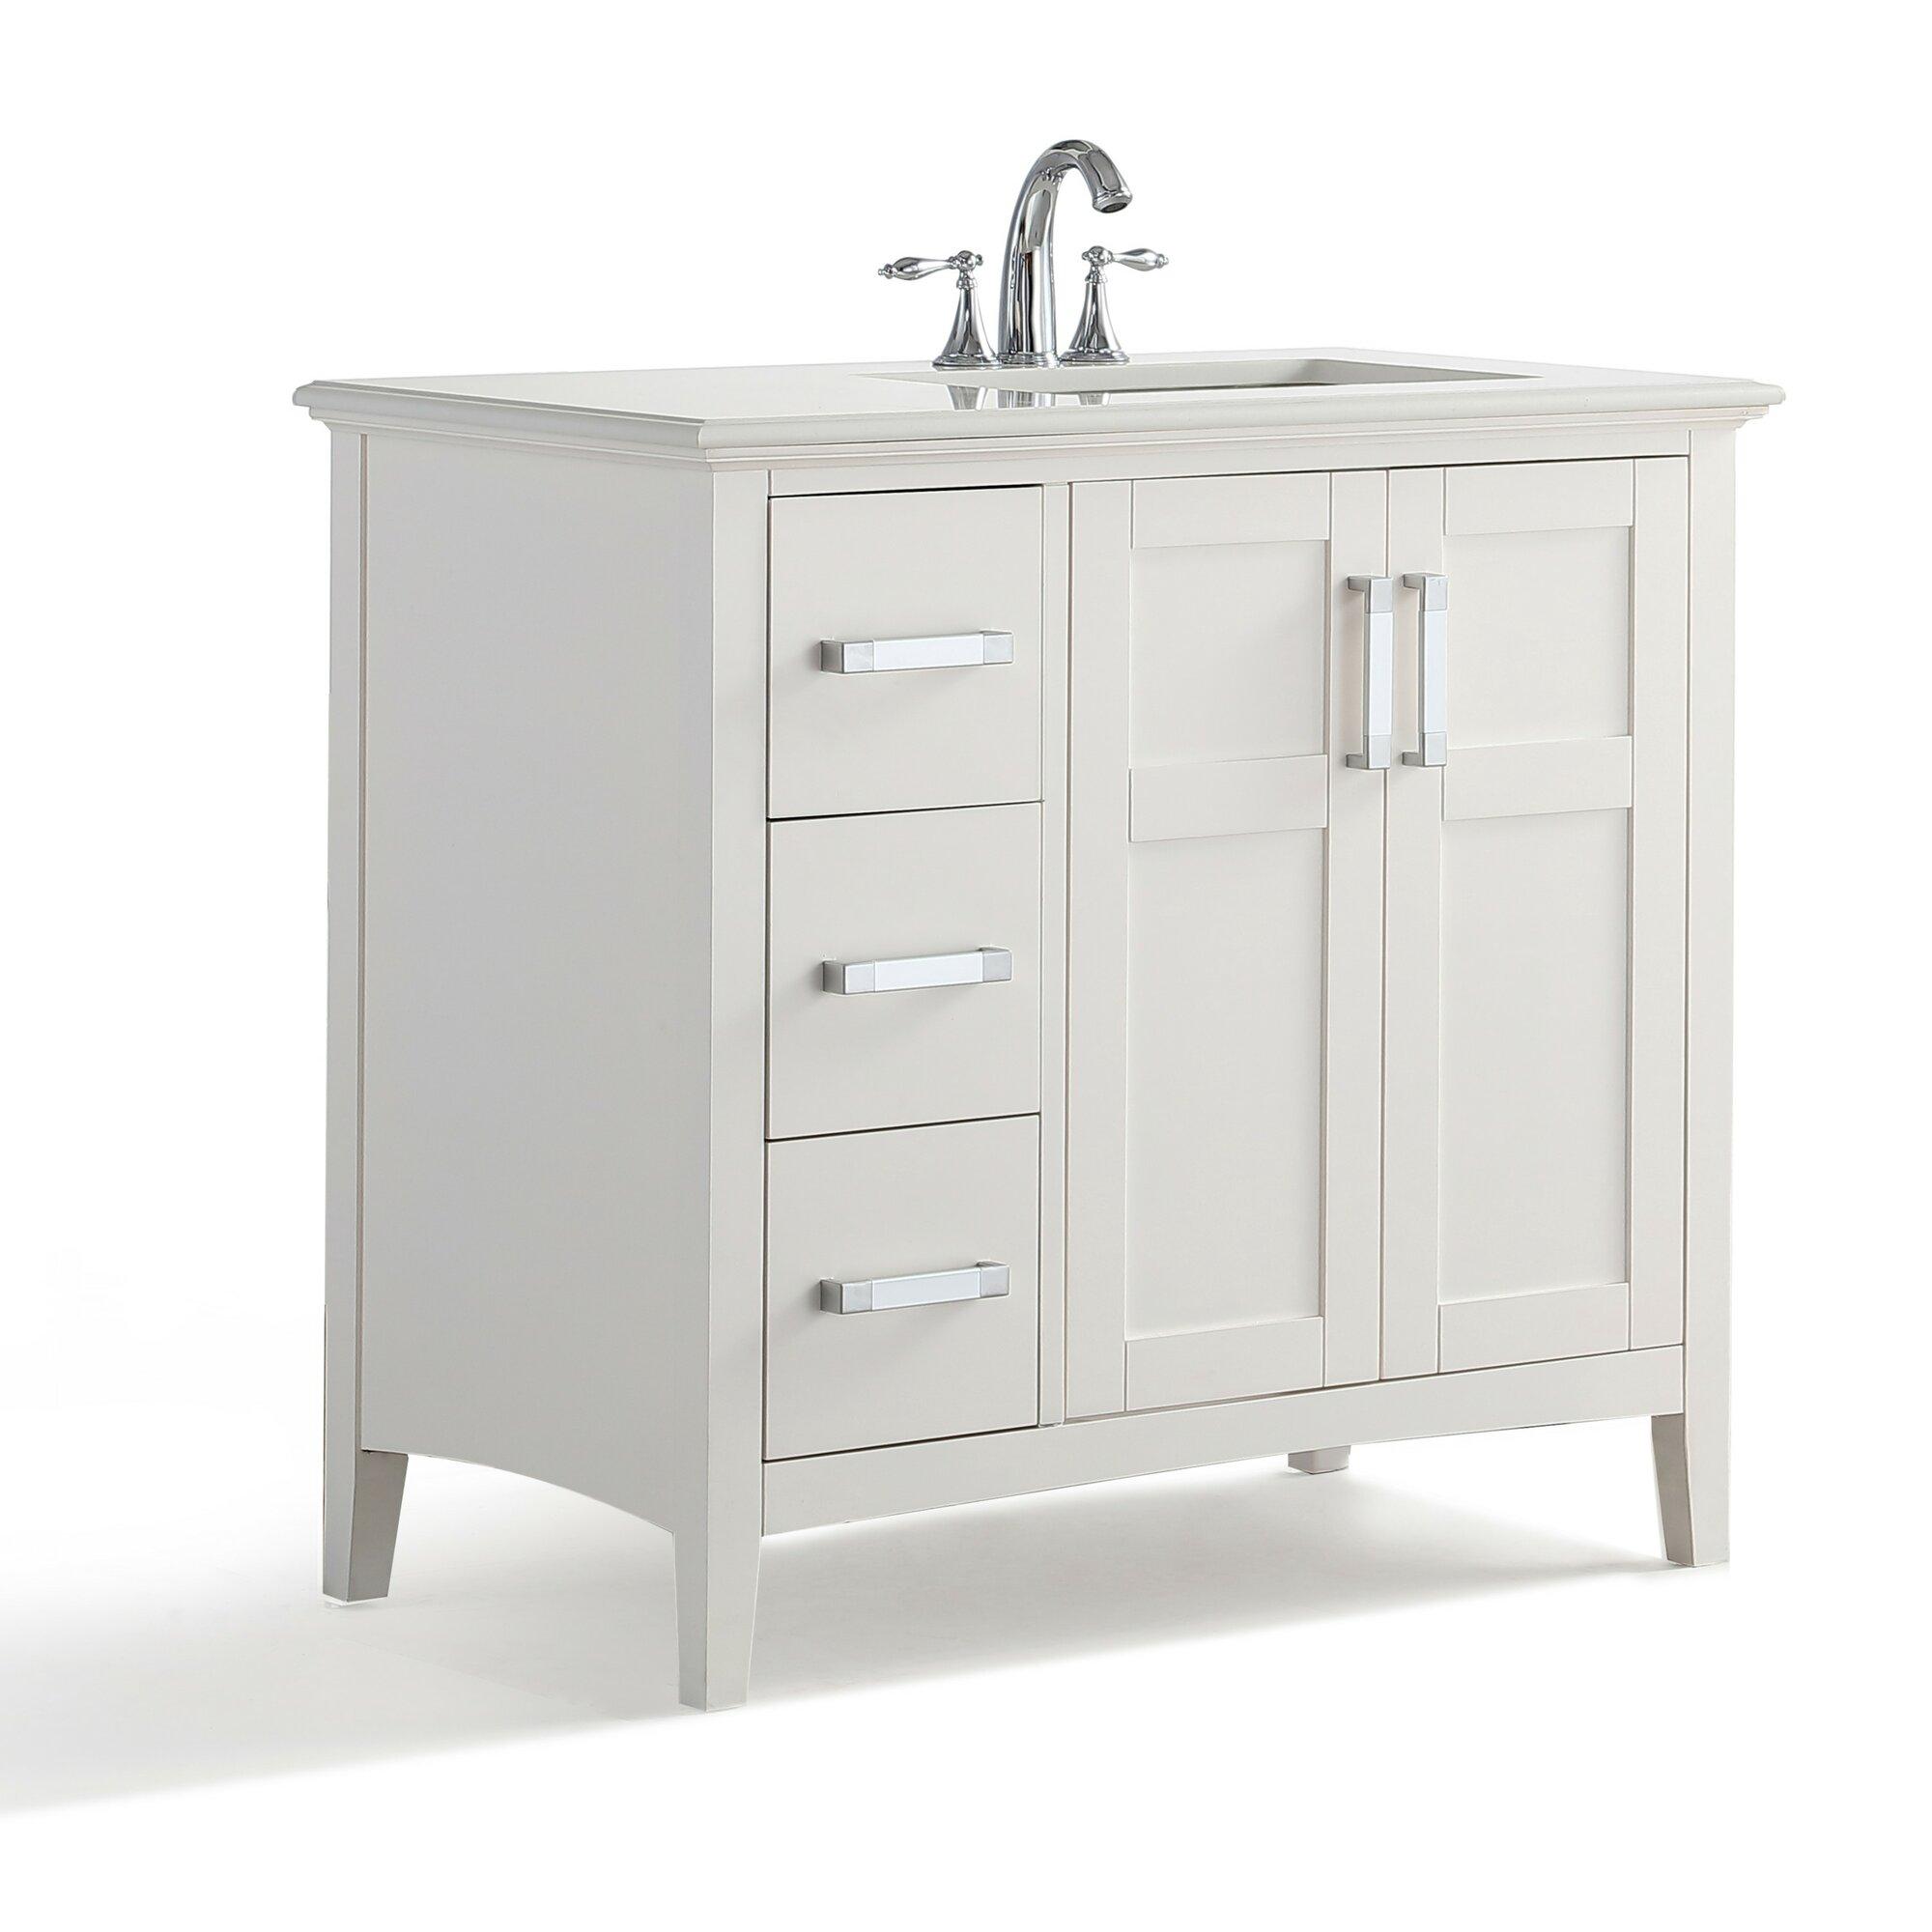 Simpli Home Winston Right Offset 37 Single Bathroom Vanity With Quartz Marble Top Reviews